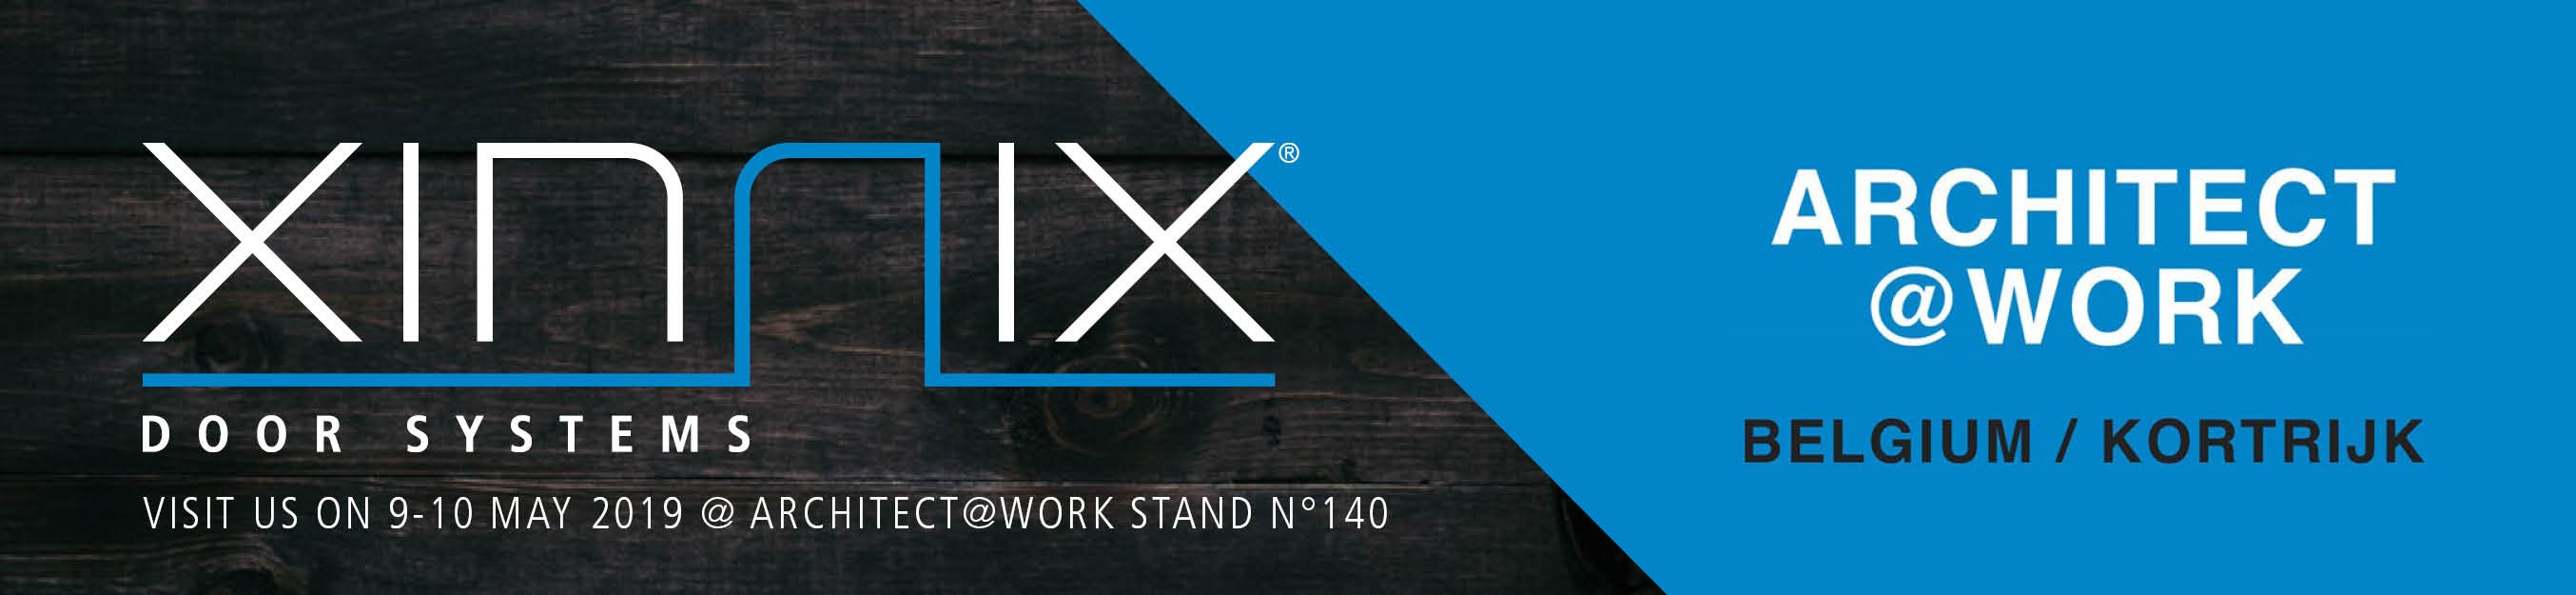 Xinnix Door Systems Linkedin